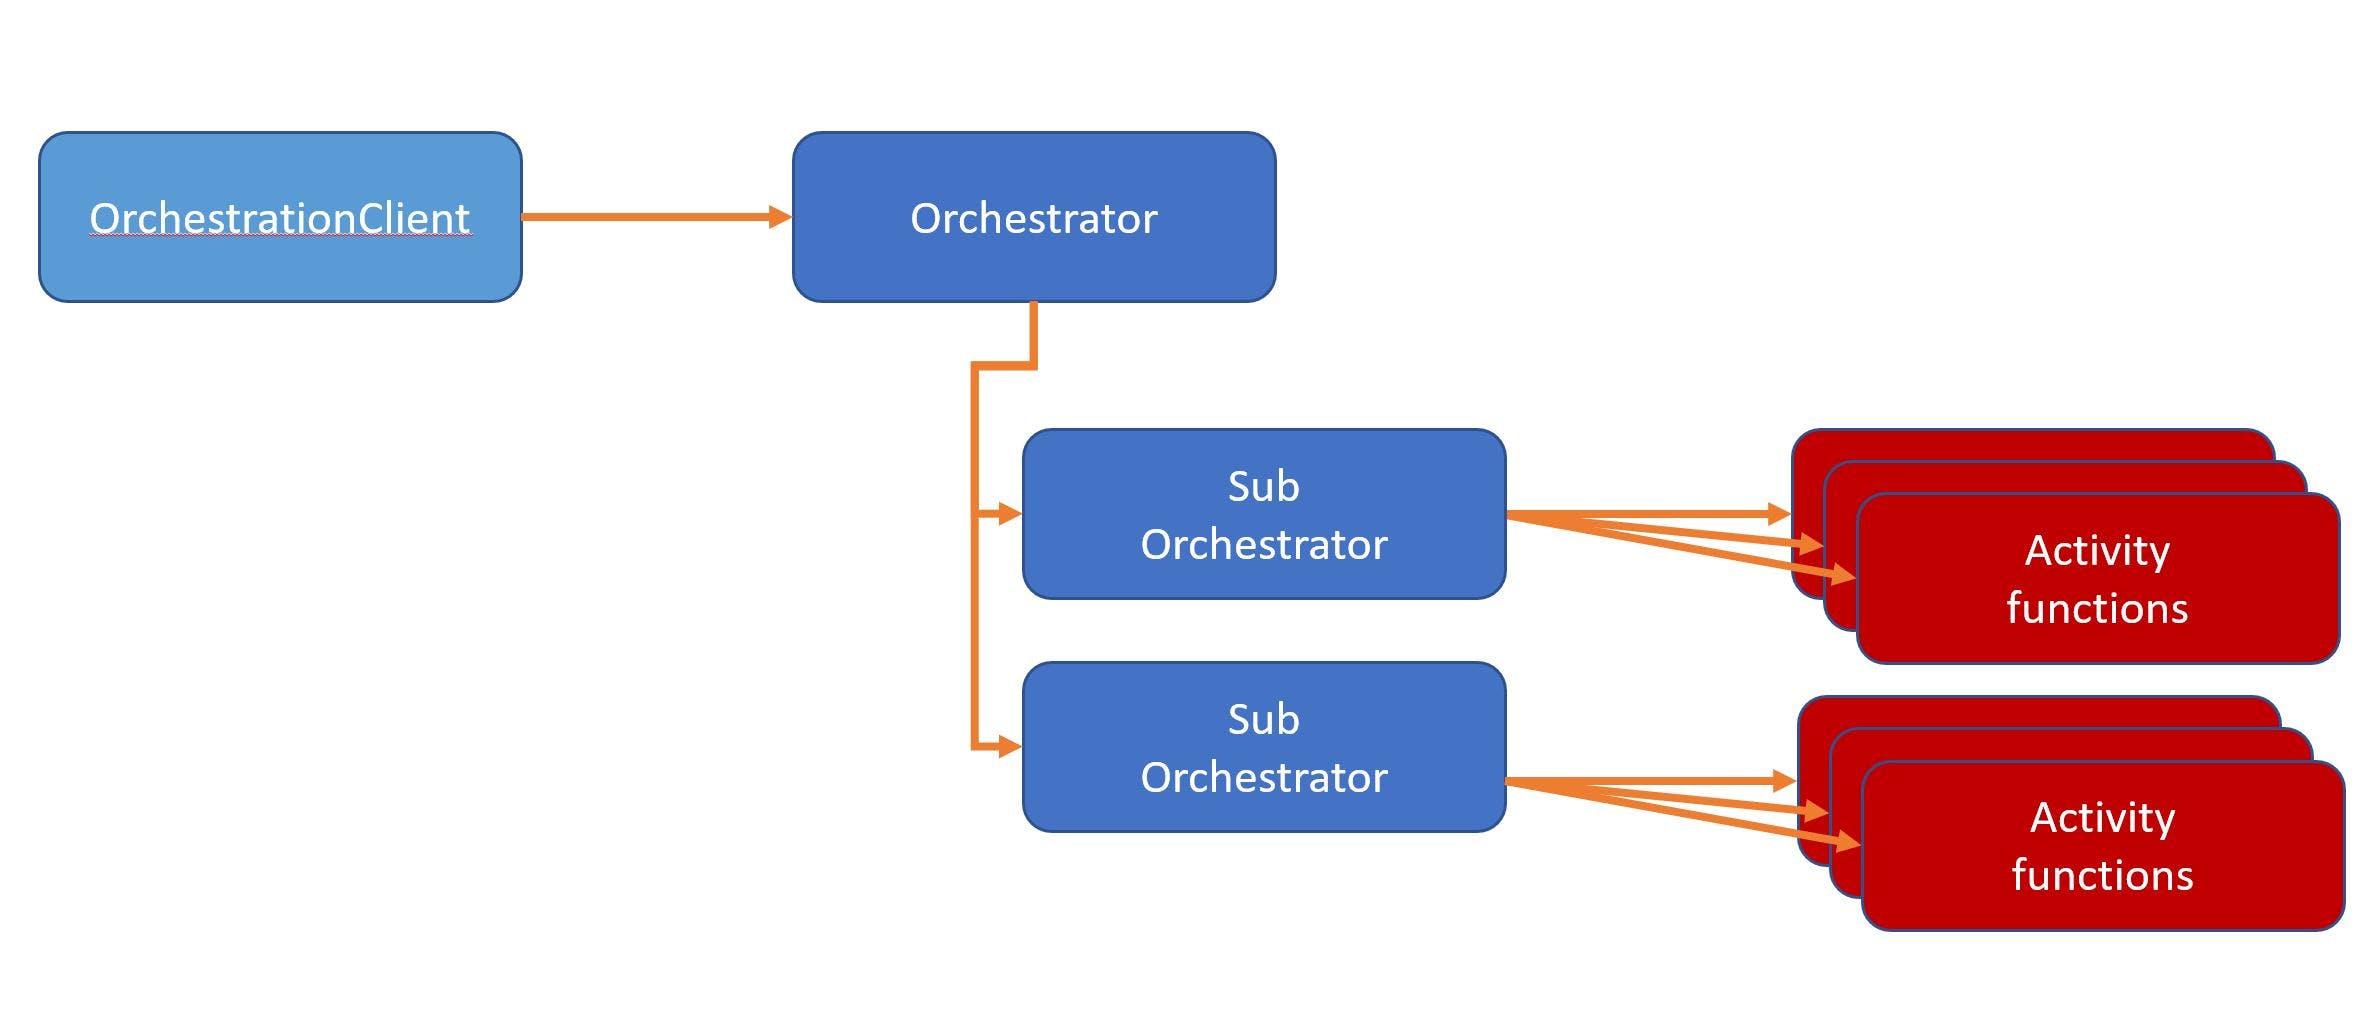 SubOrchestrator.JPG